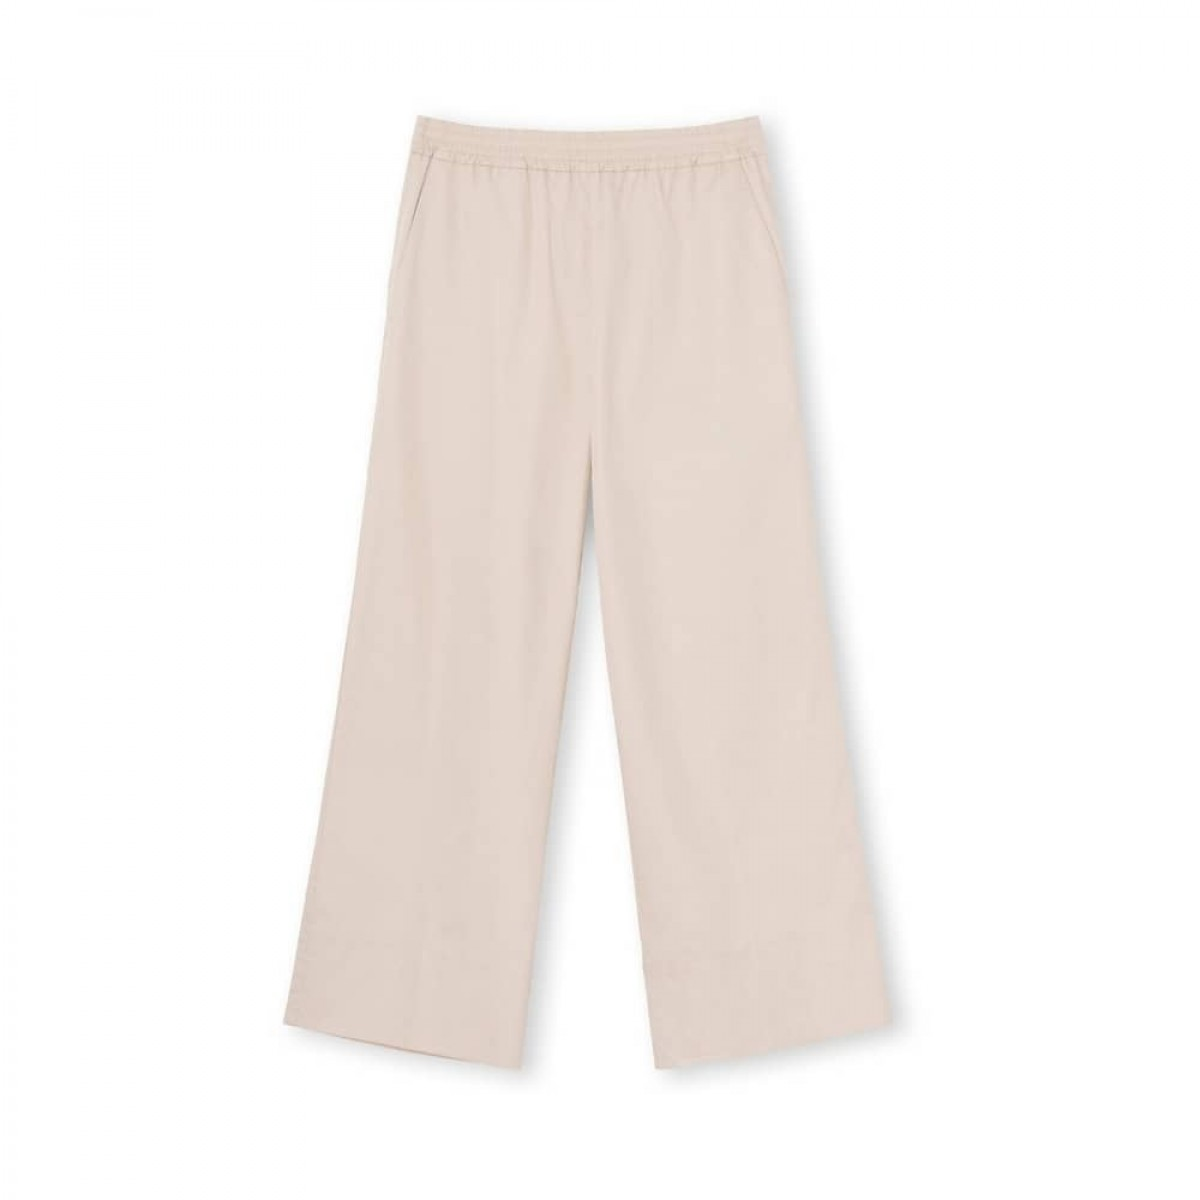 rosanna bukser - beige